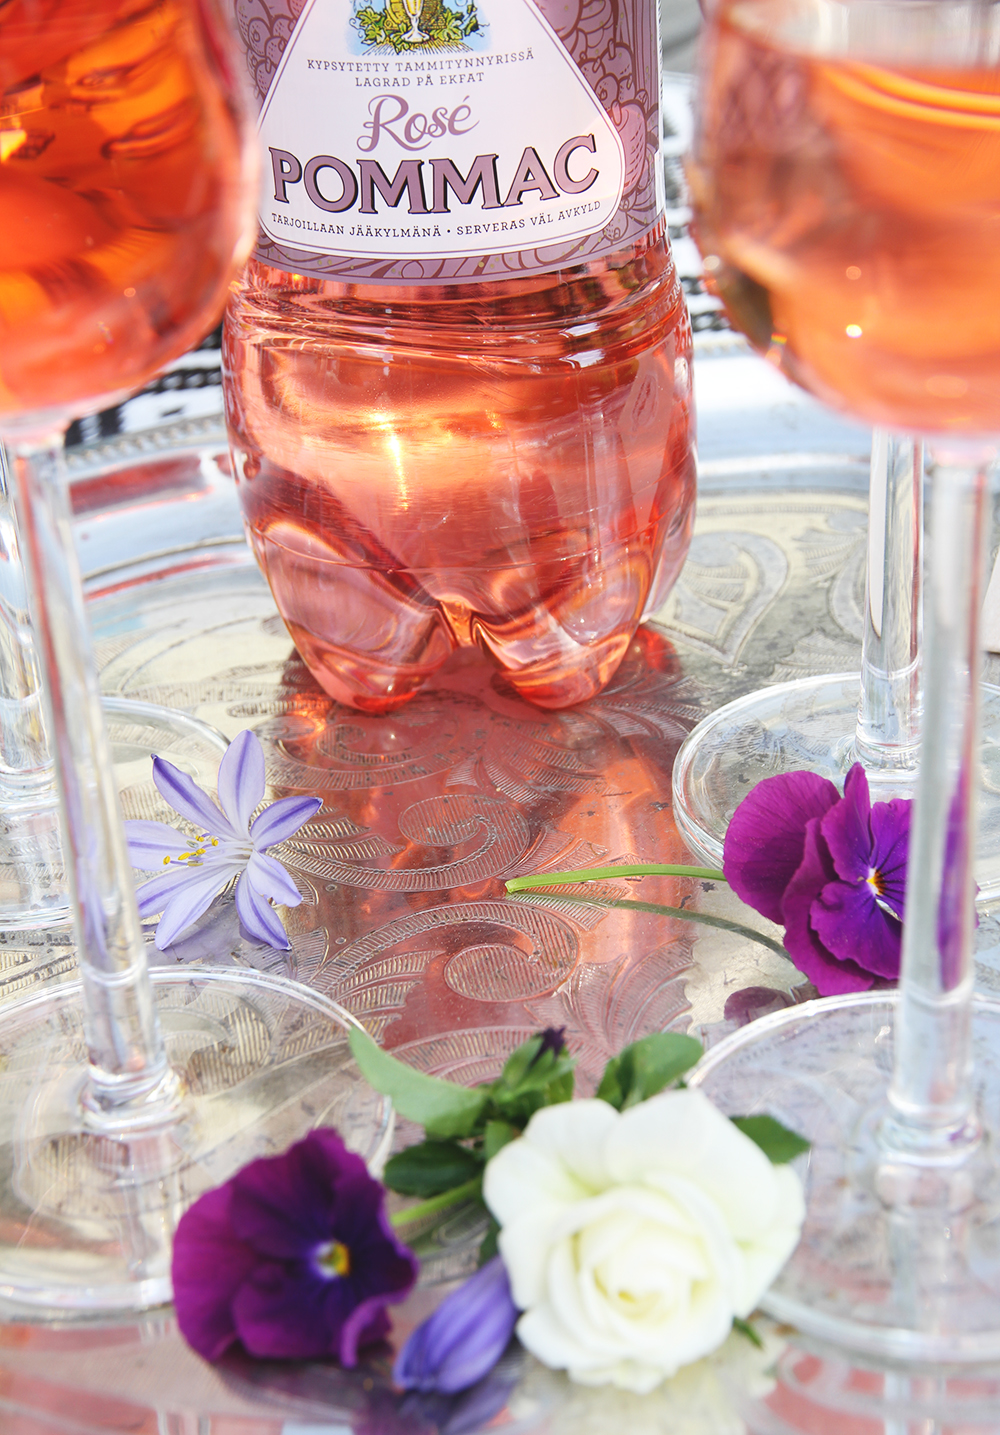 iittala essence arvonta hartwall pommac rose hunajaista